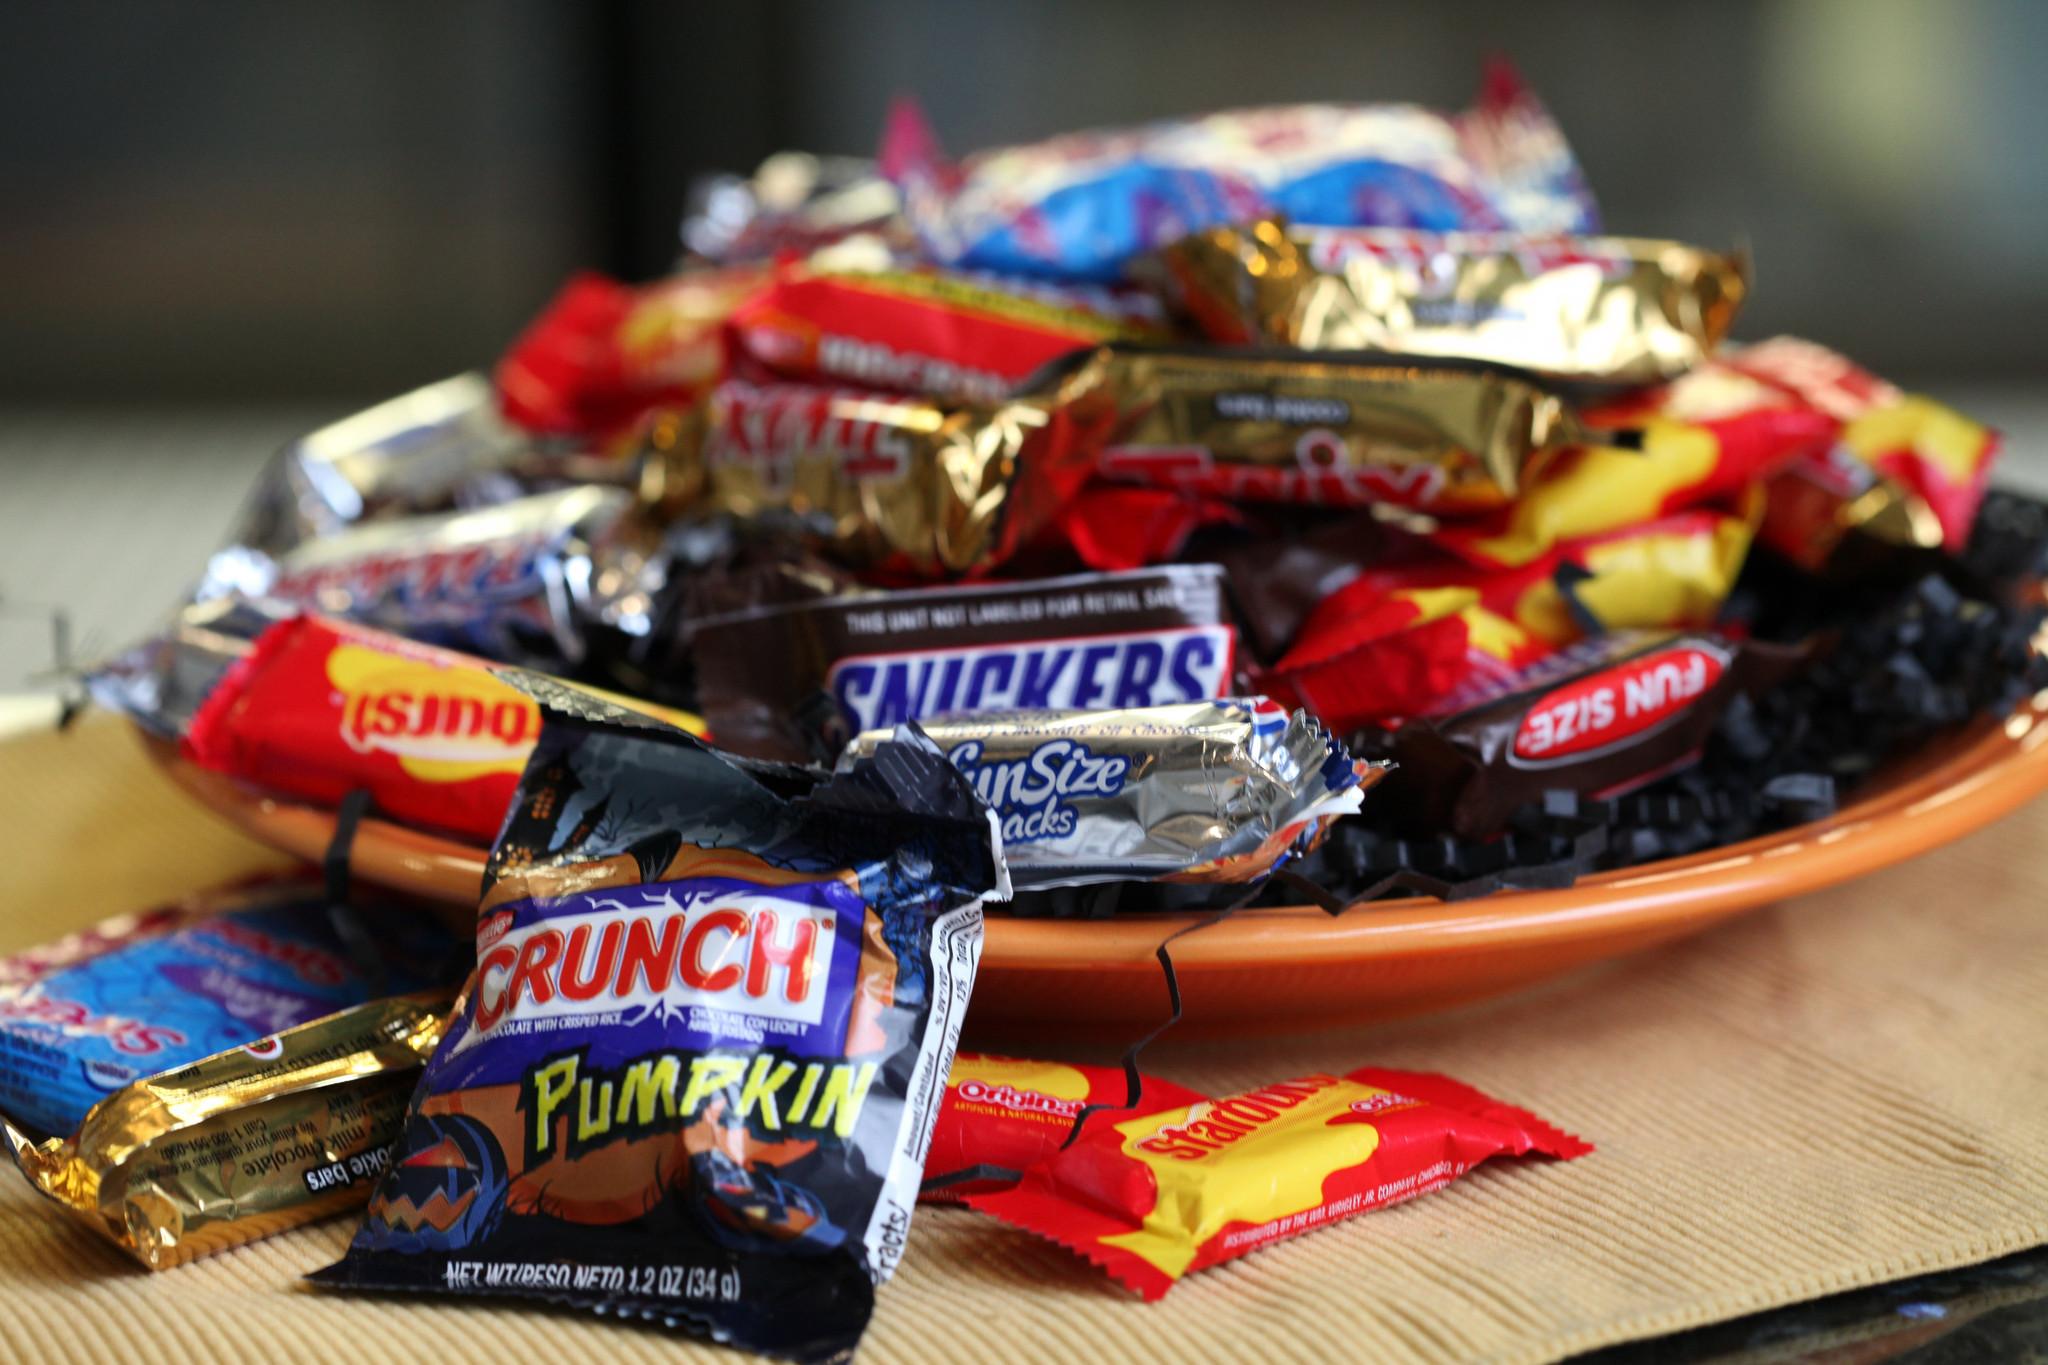 Photos: Best and worst Halloween candy - Chicago Tribune